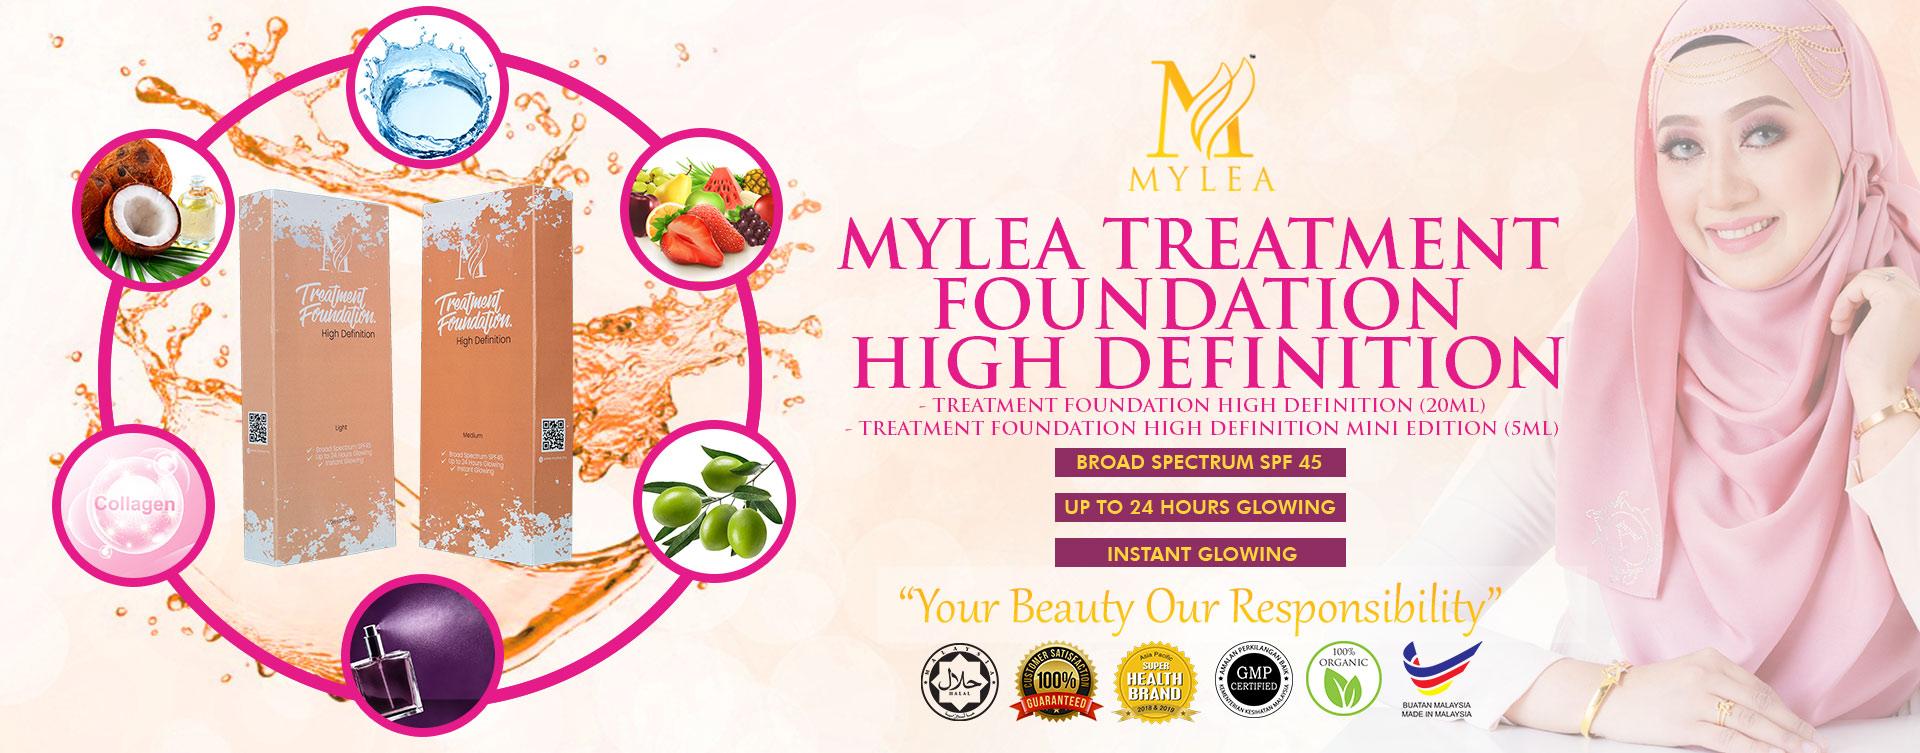 NEW-treatment-foundation-subheader-mylea